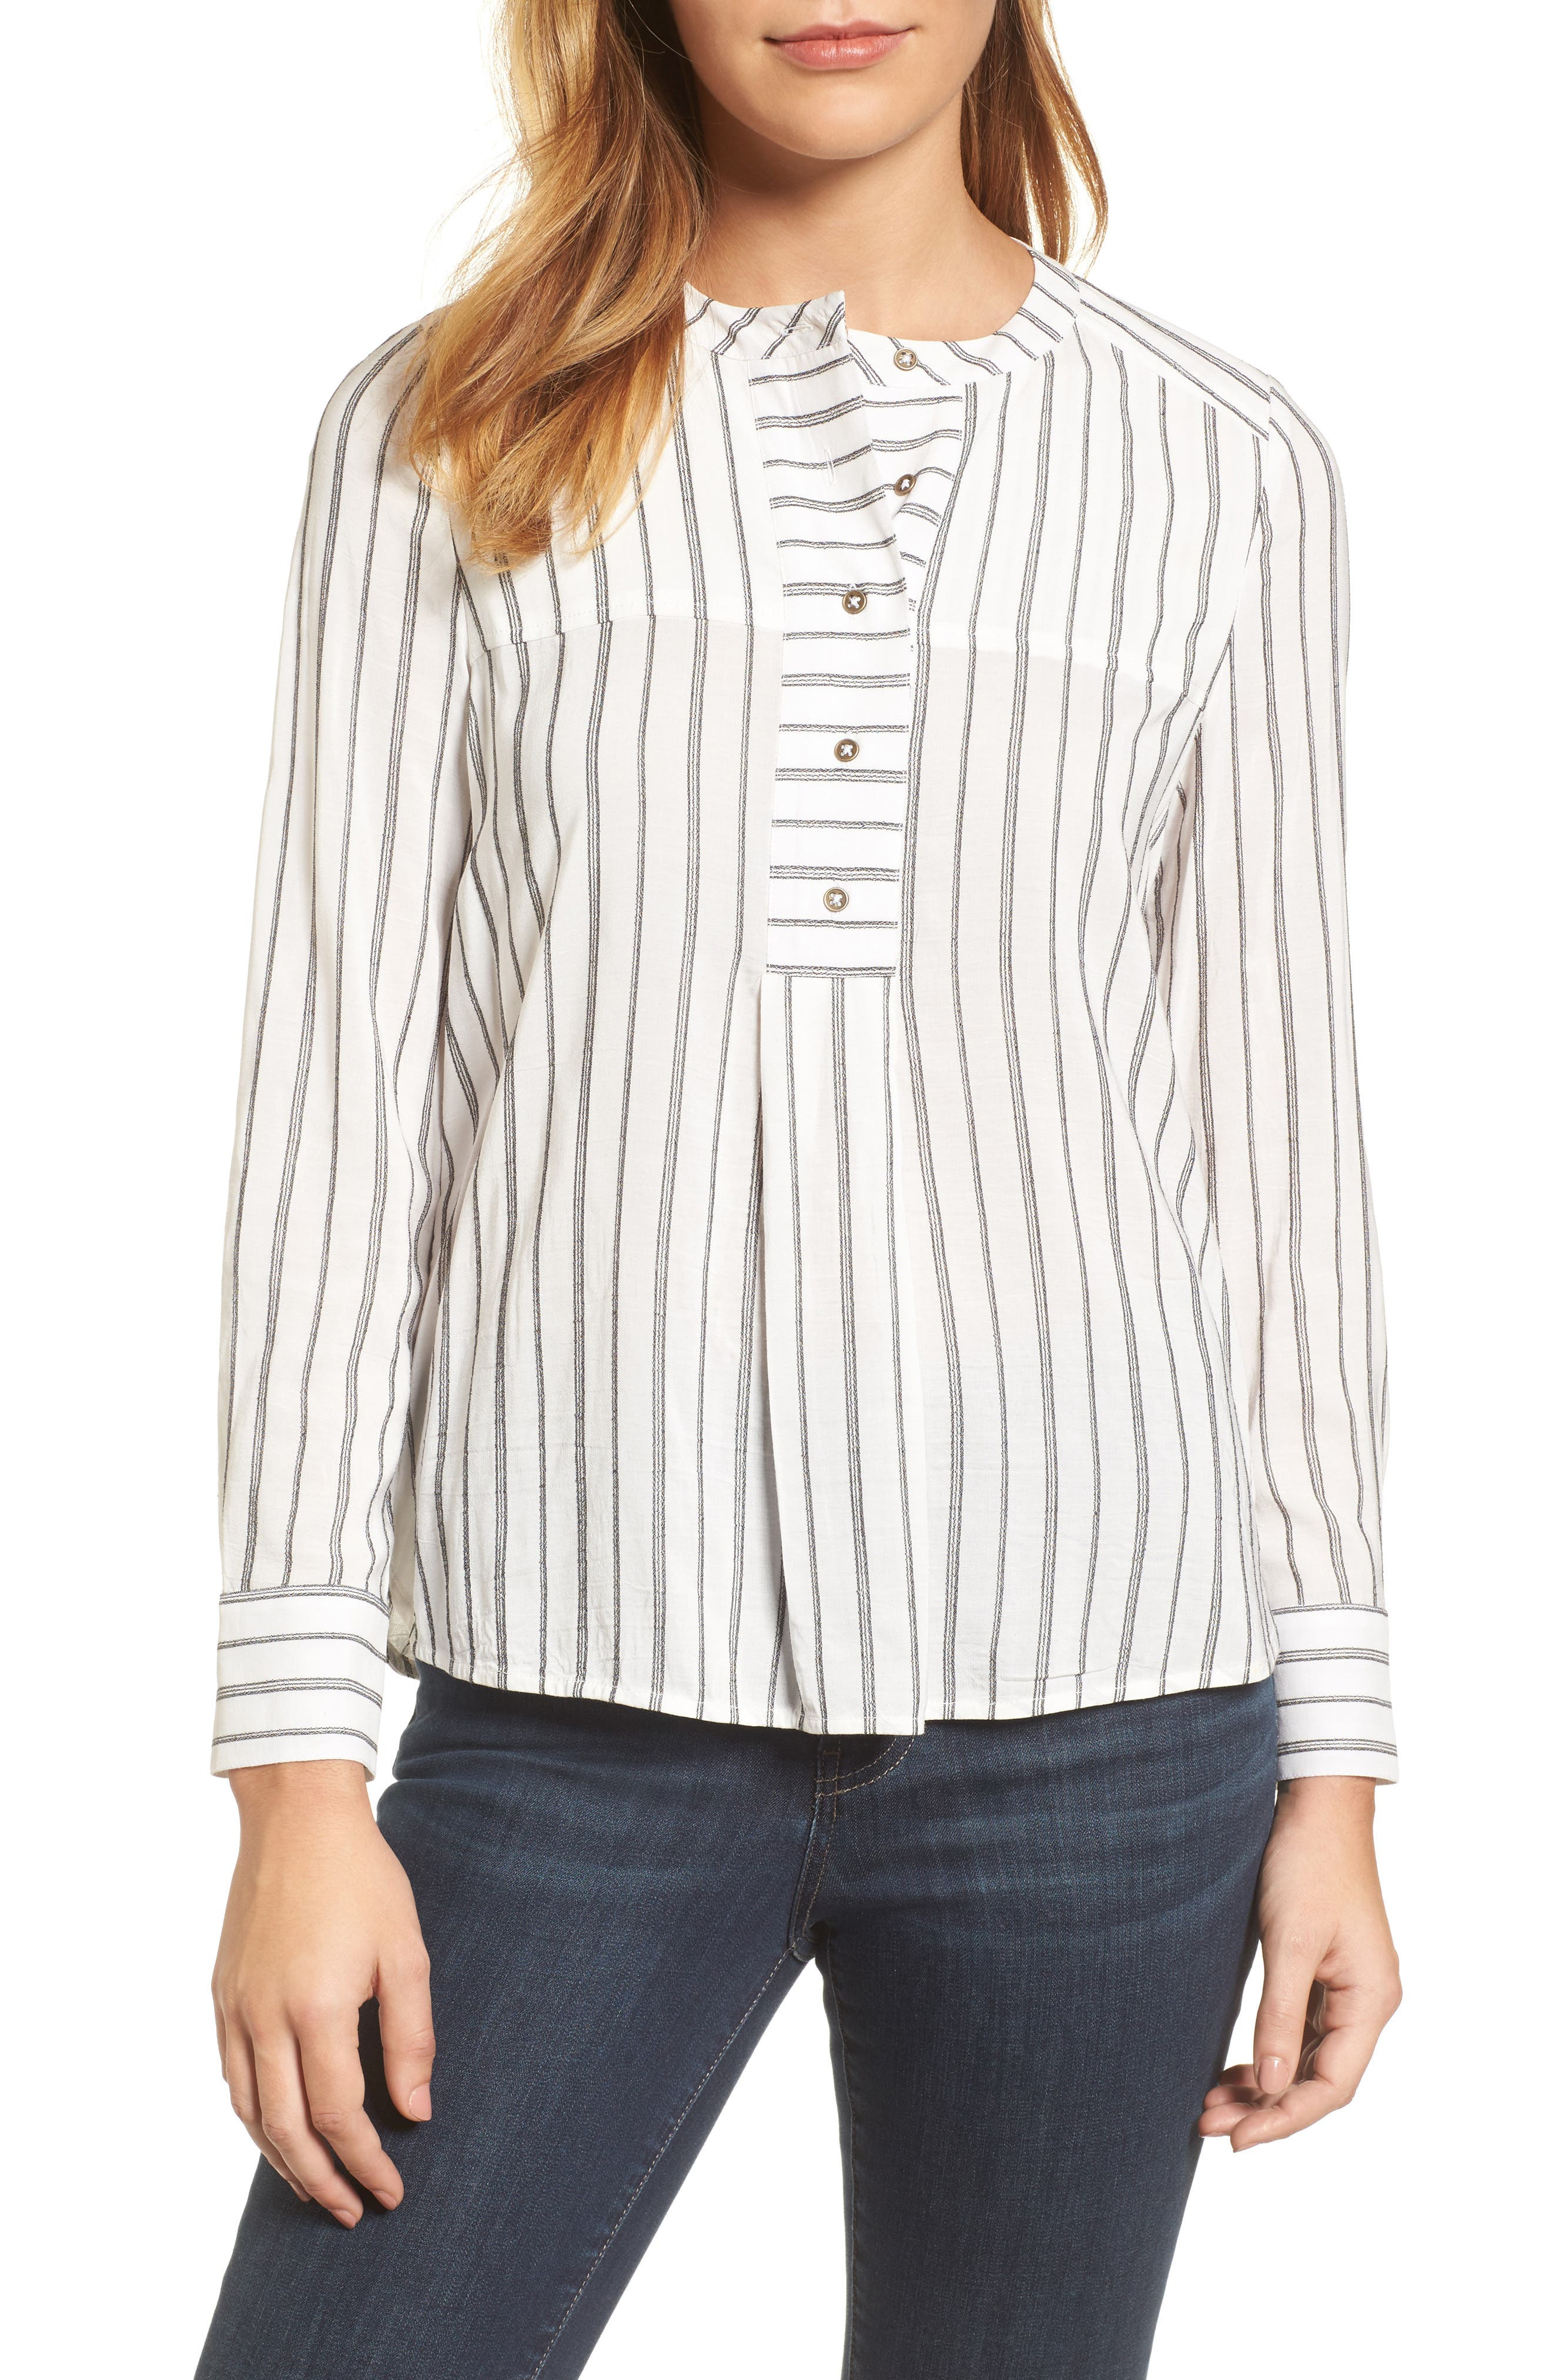 Main Image - Lucky Brand Woven Stripe Top